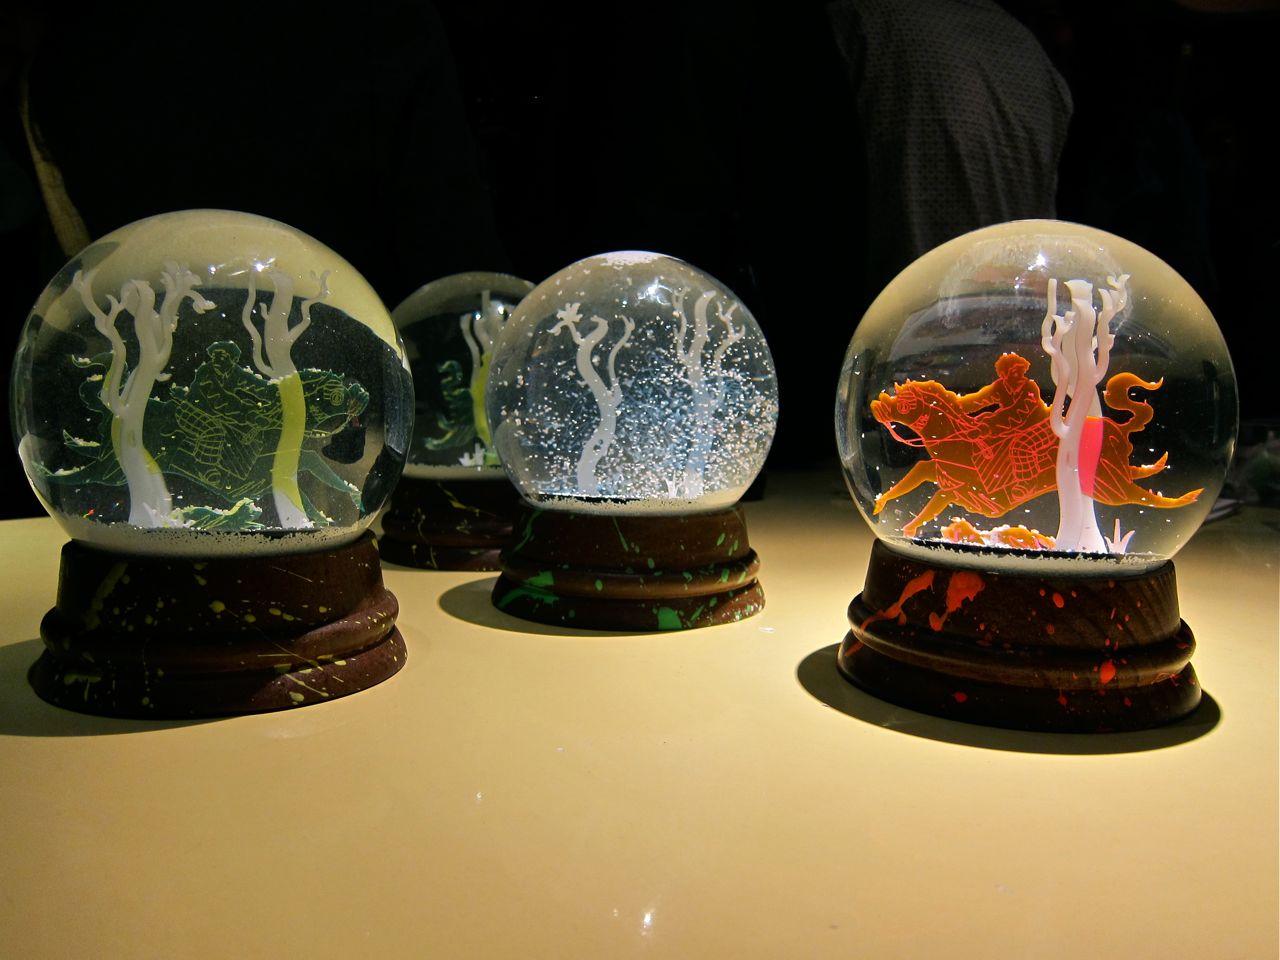 openings tomokazu matsuyama x the standard snow globes arrested motion